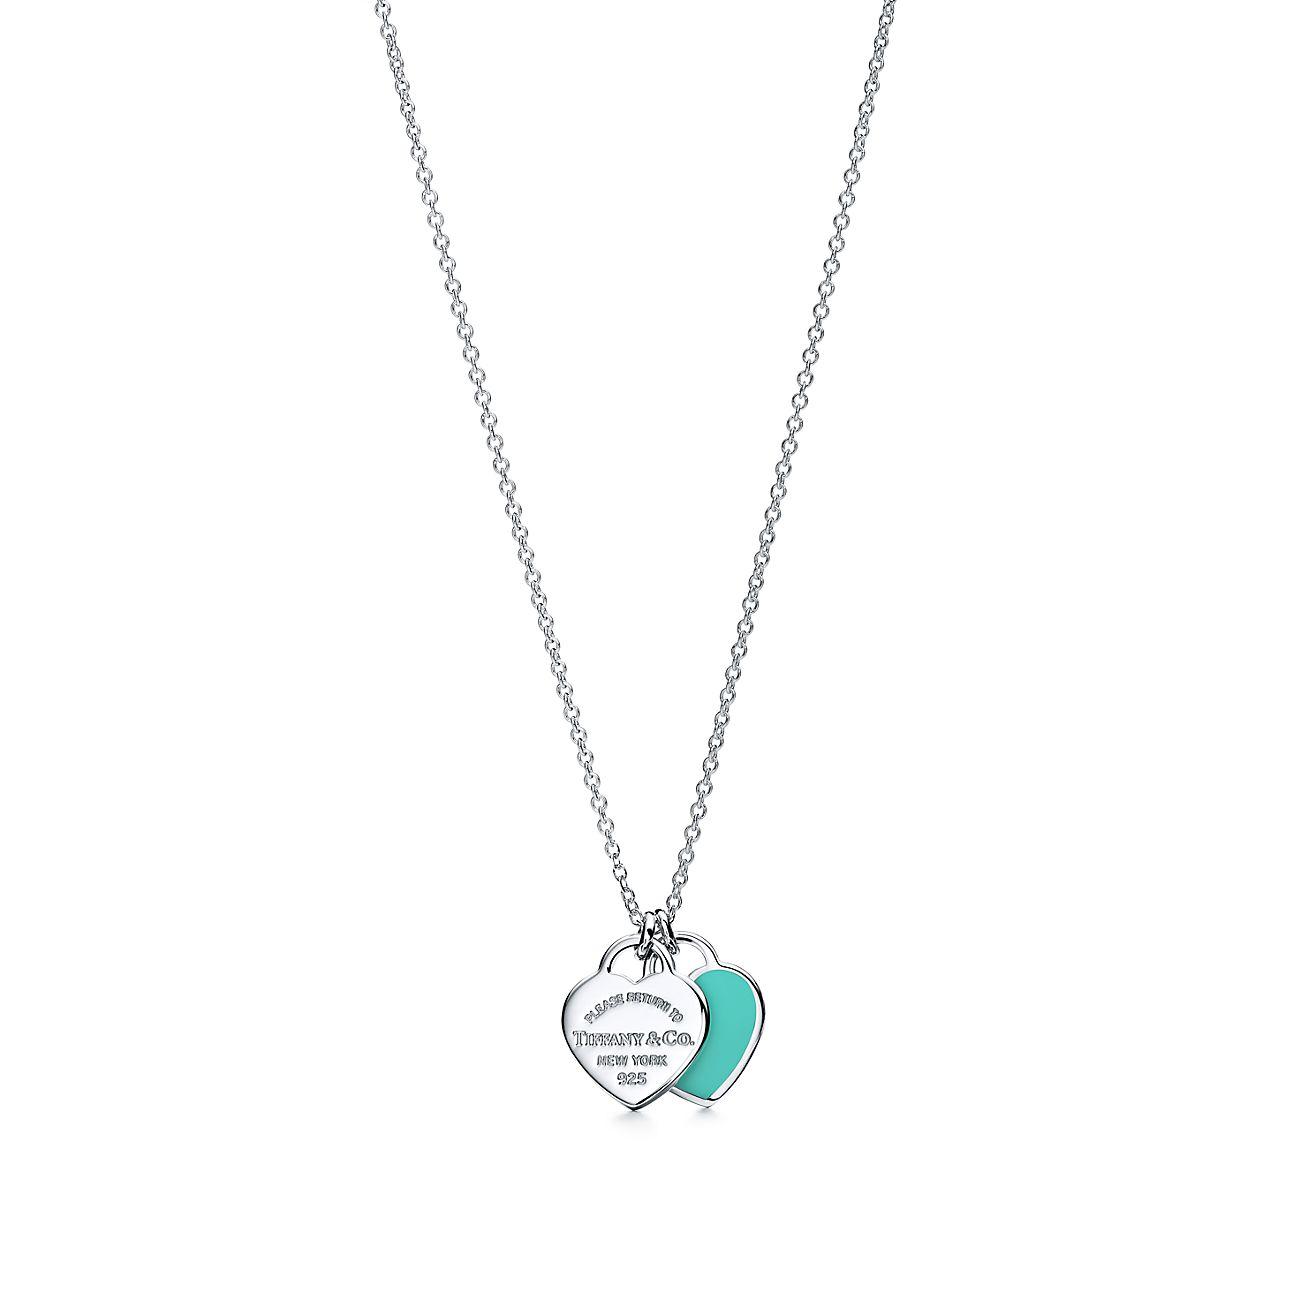 Return To Tiffany Mini Double Heart Tag Pendant In Silver With Tiffany Blue Enamel Finish On A 16 Chain Tiffany Co